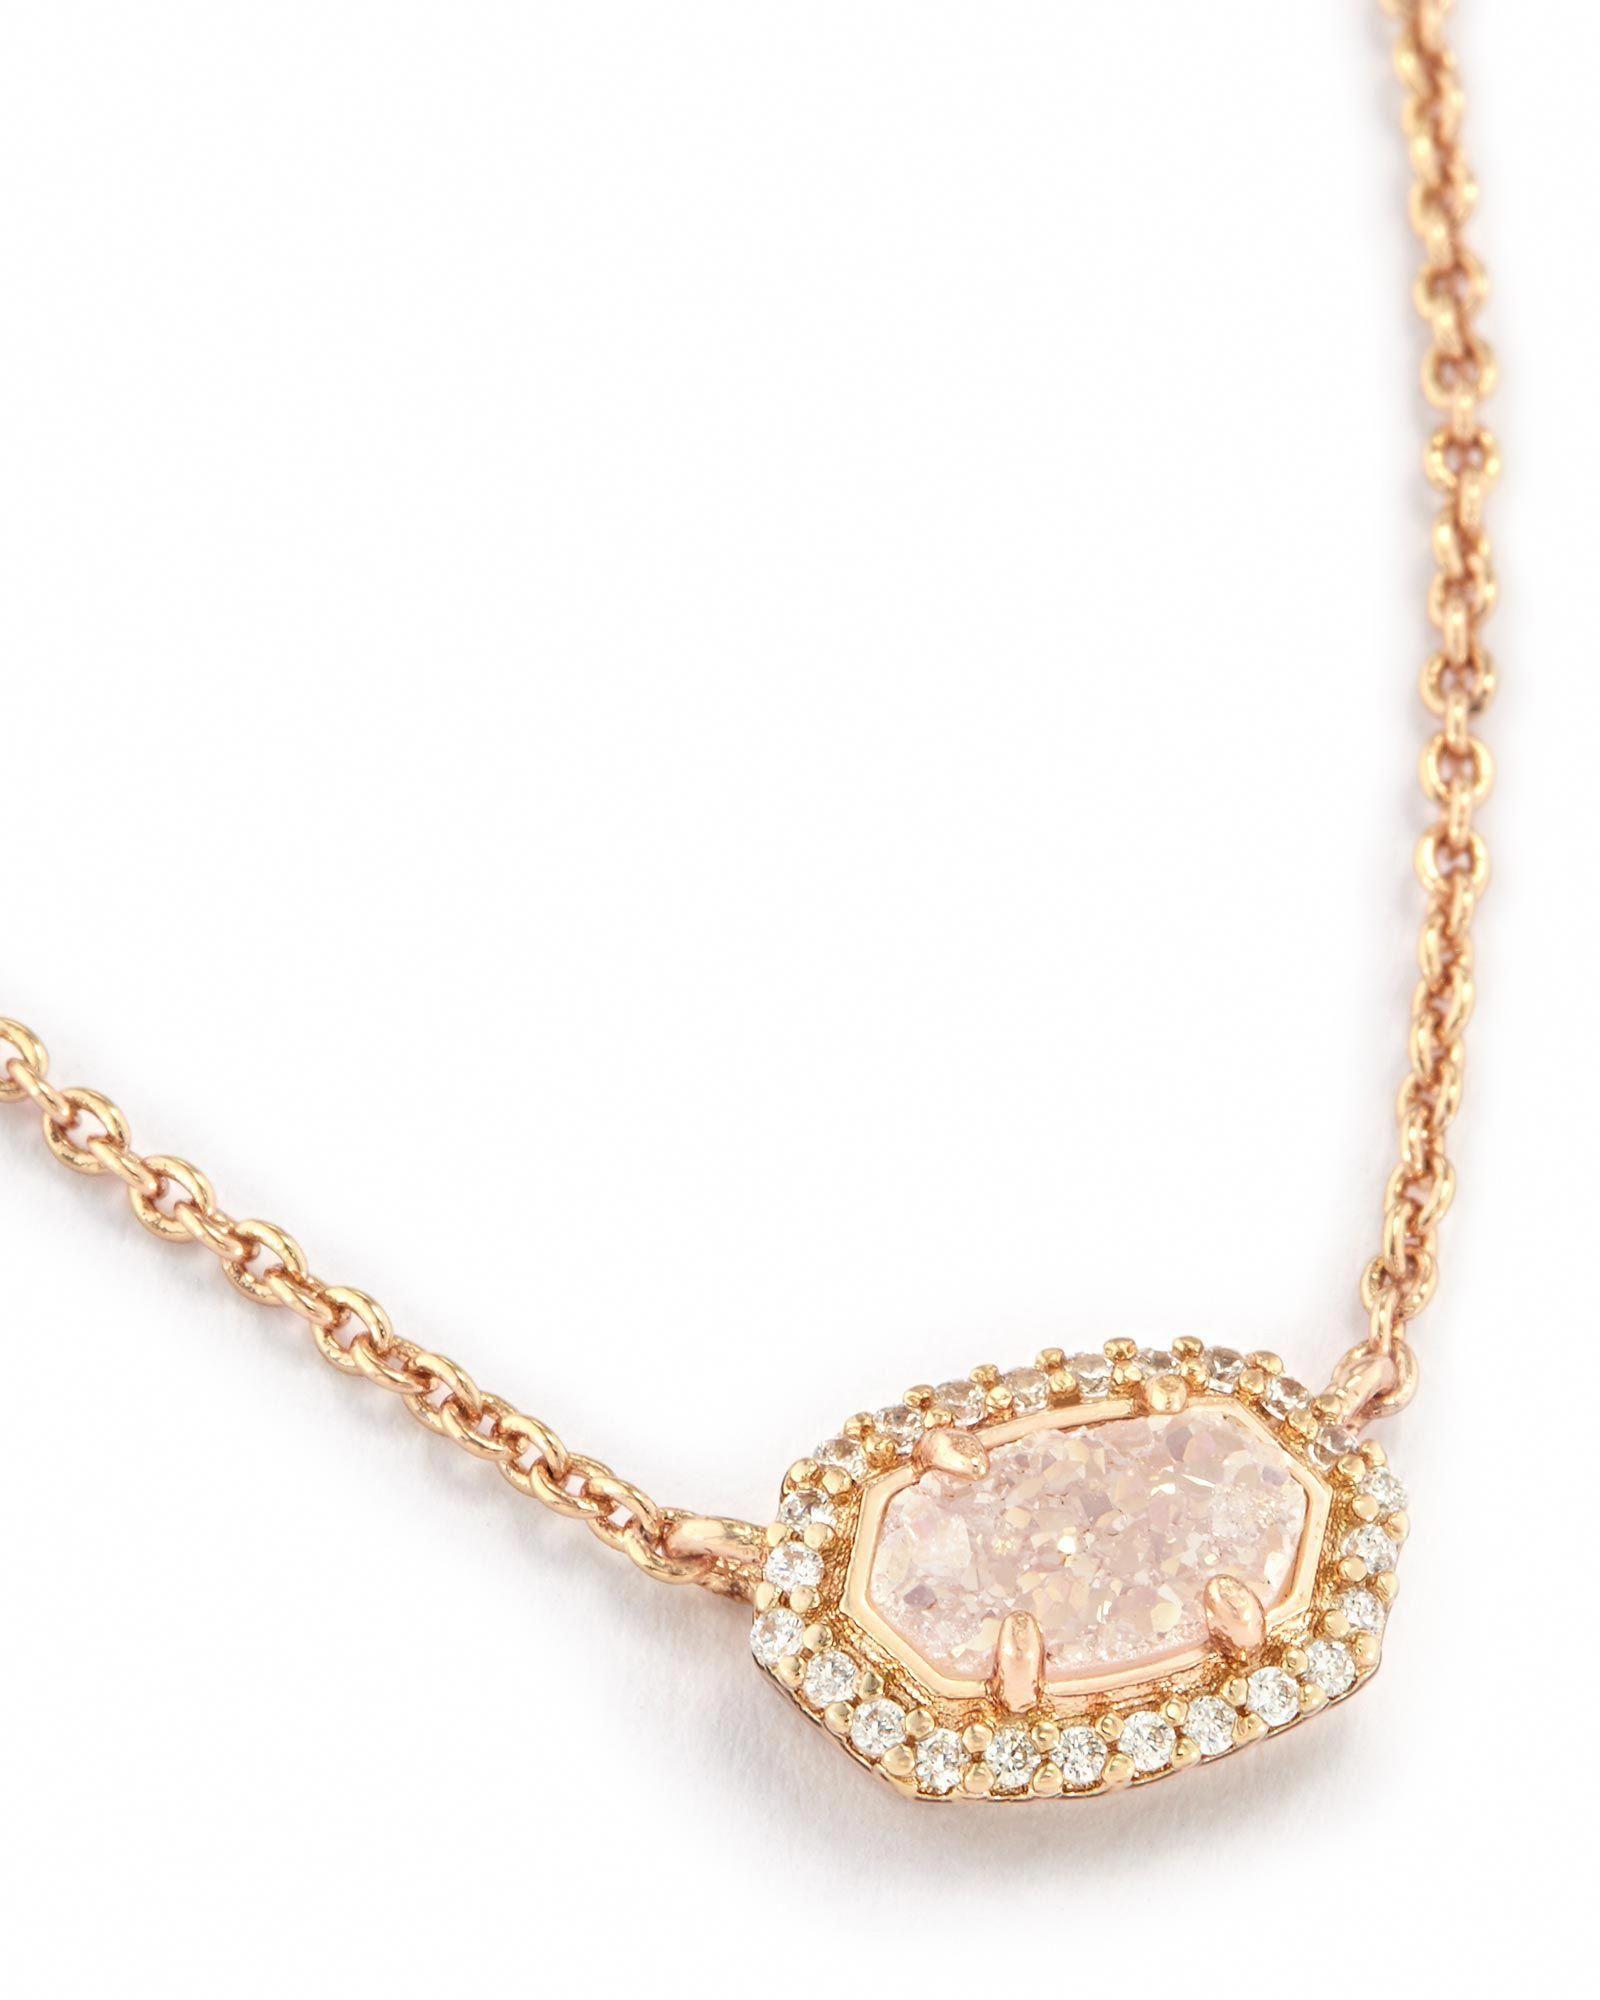 Chelsea Pendant Necklace in Rose Gold Kendra Scott